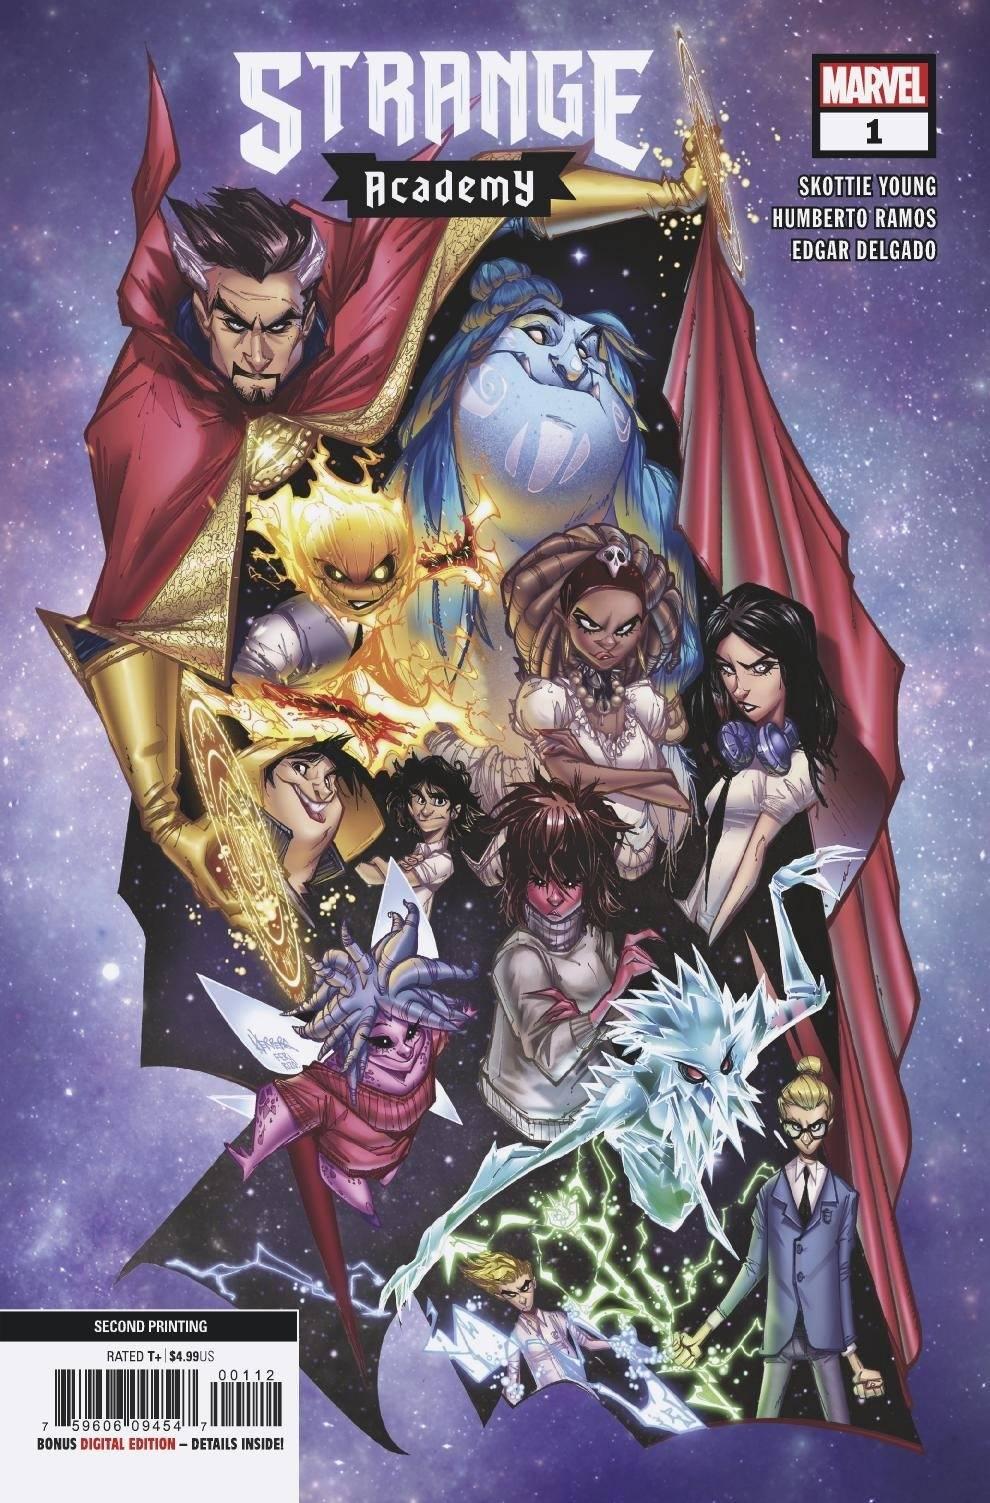 STL158535 ComicList: Marvel Comics New Releases for 07/22/2020